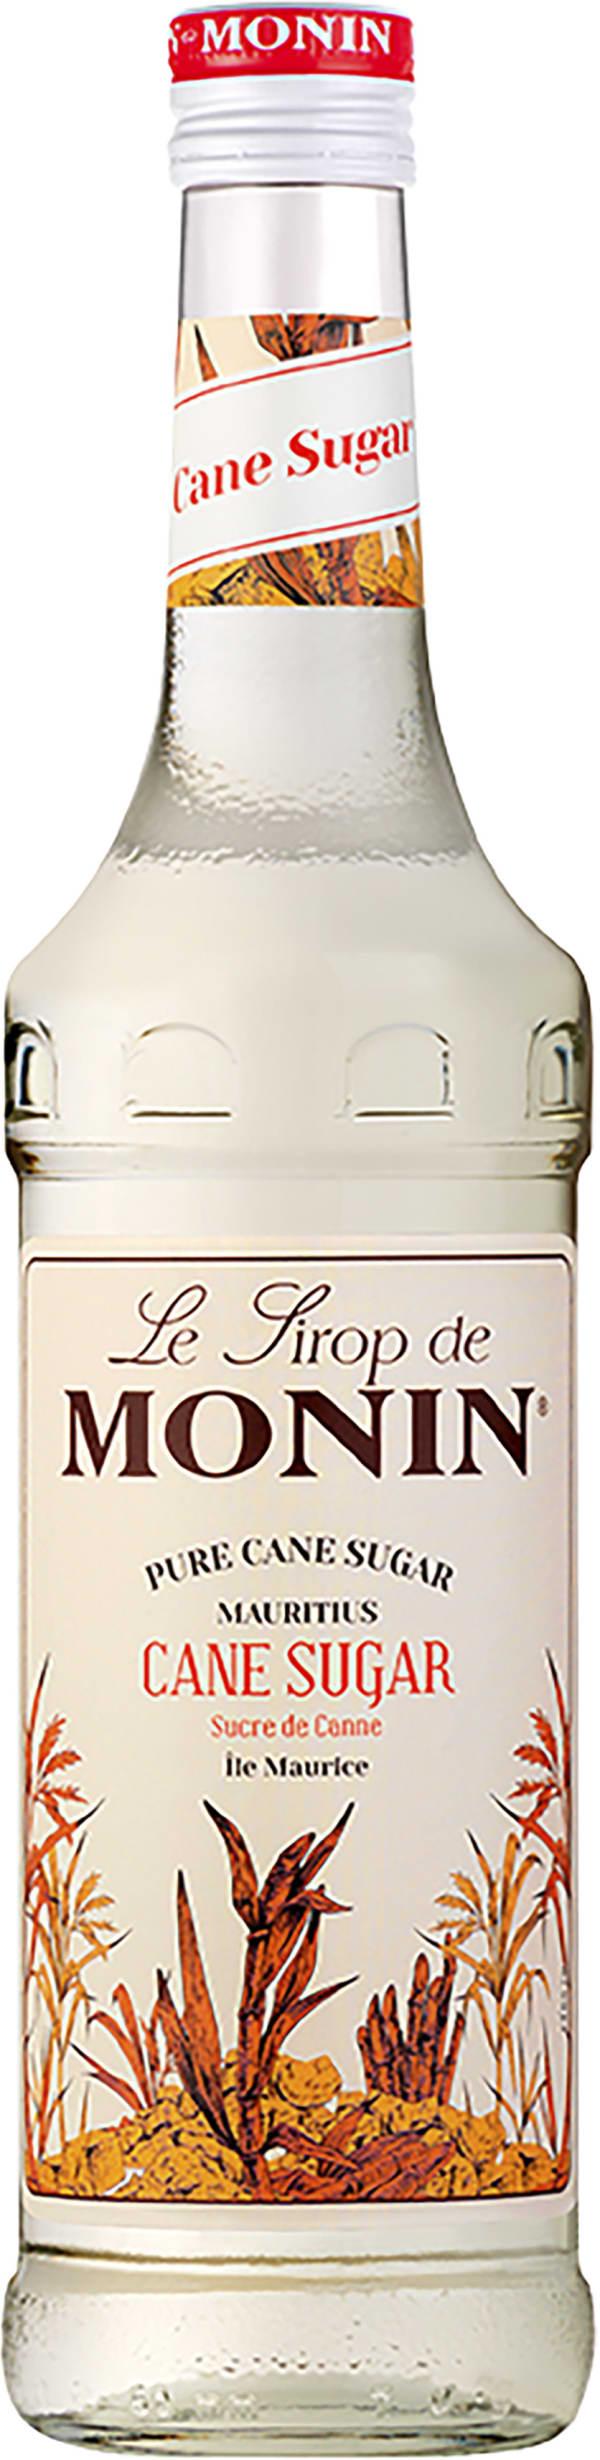 Le Sirop de Monin Pure Cane Sugar